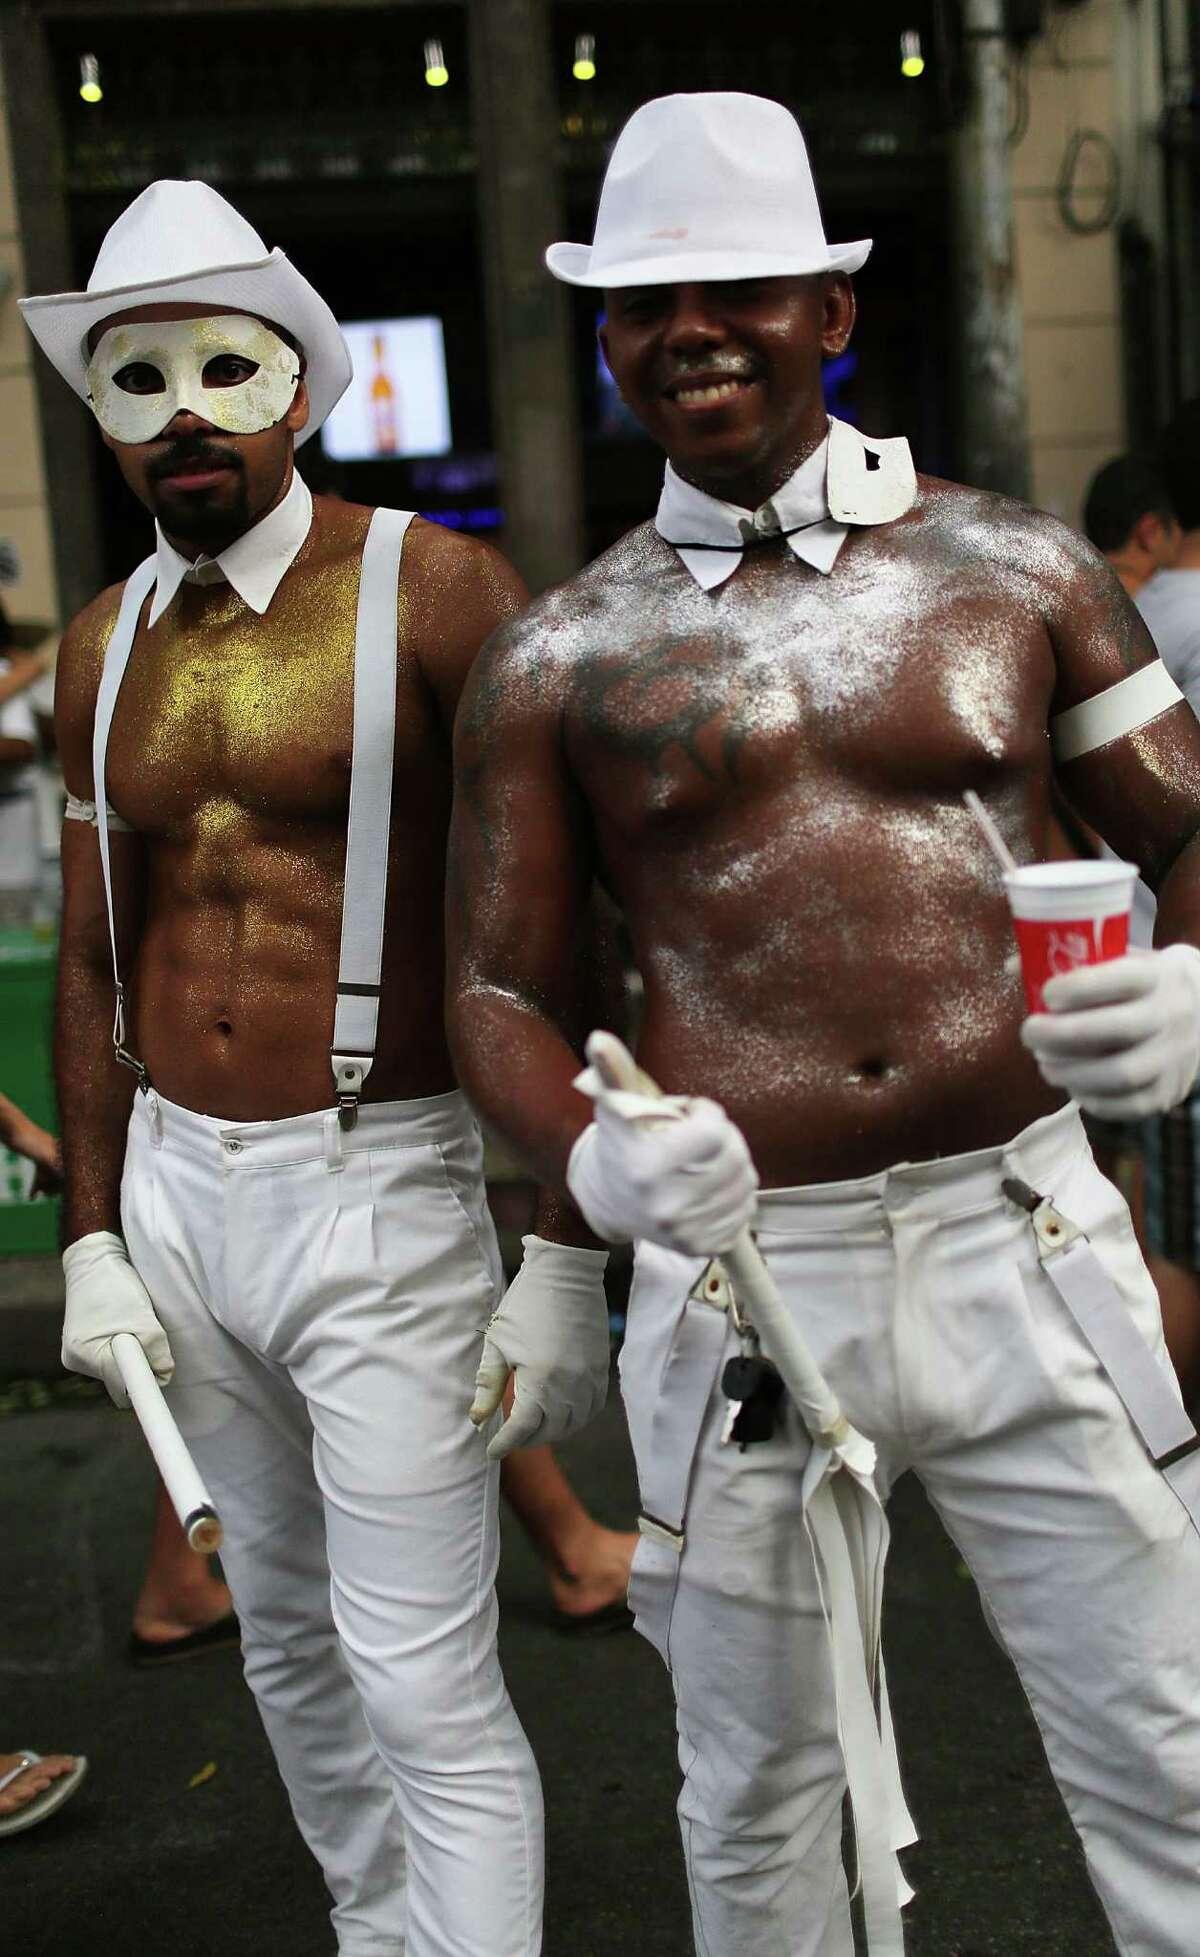 Revelers pose during street Carnival celebrations on Feb. 16, 2015 in Rio de Janeiro, Brazil. Official Carnival celebrations run until February 17.